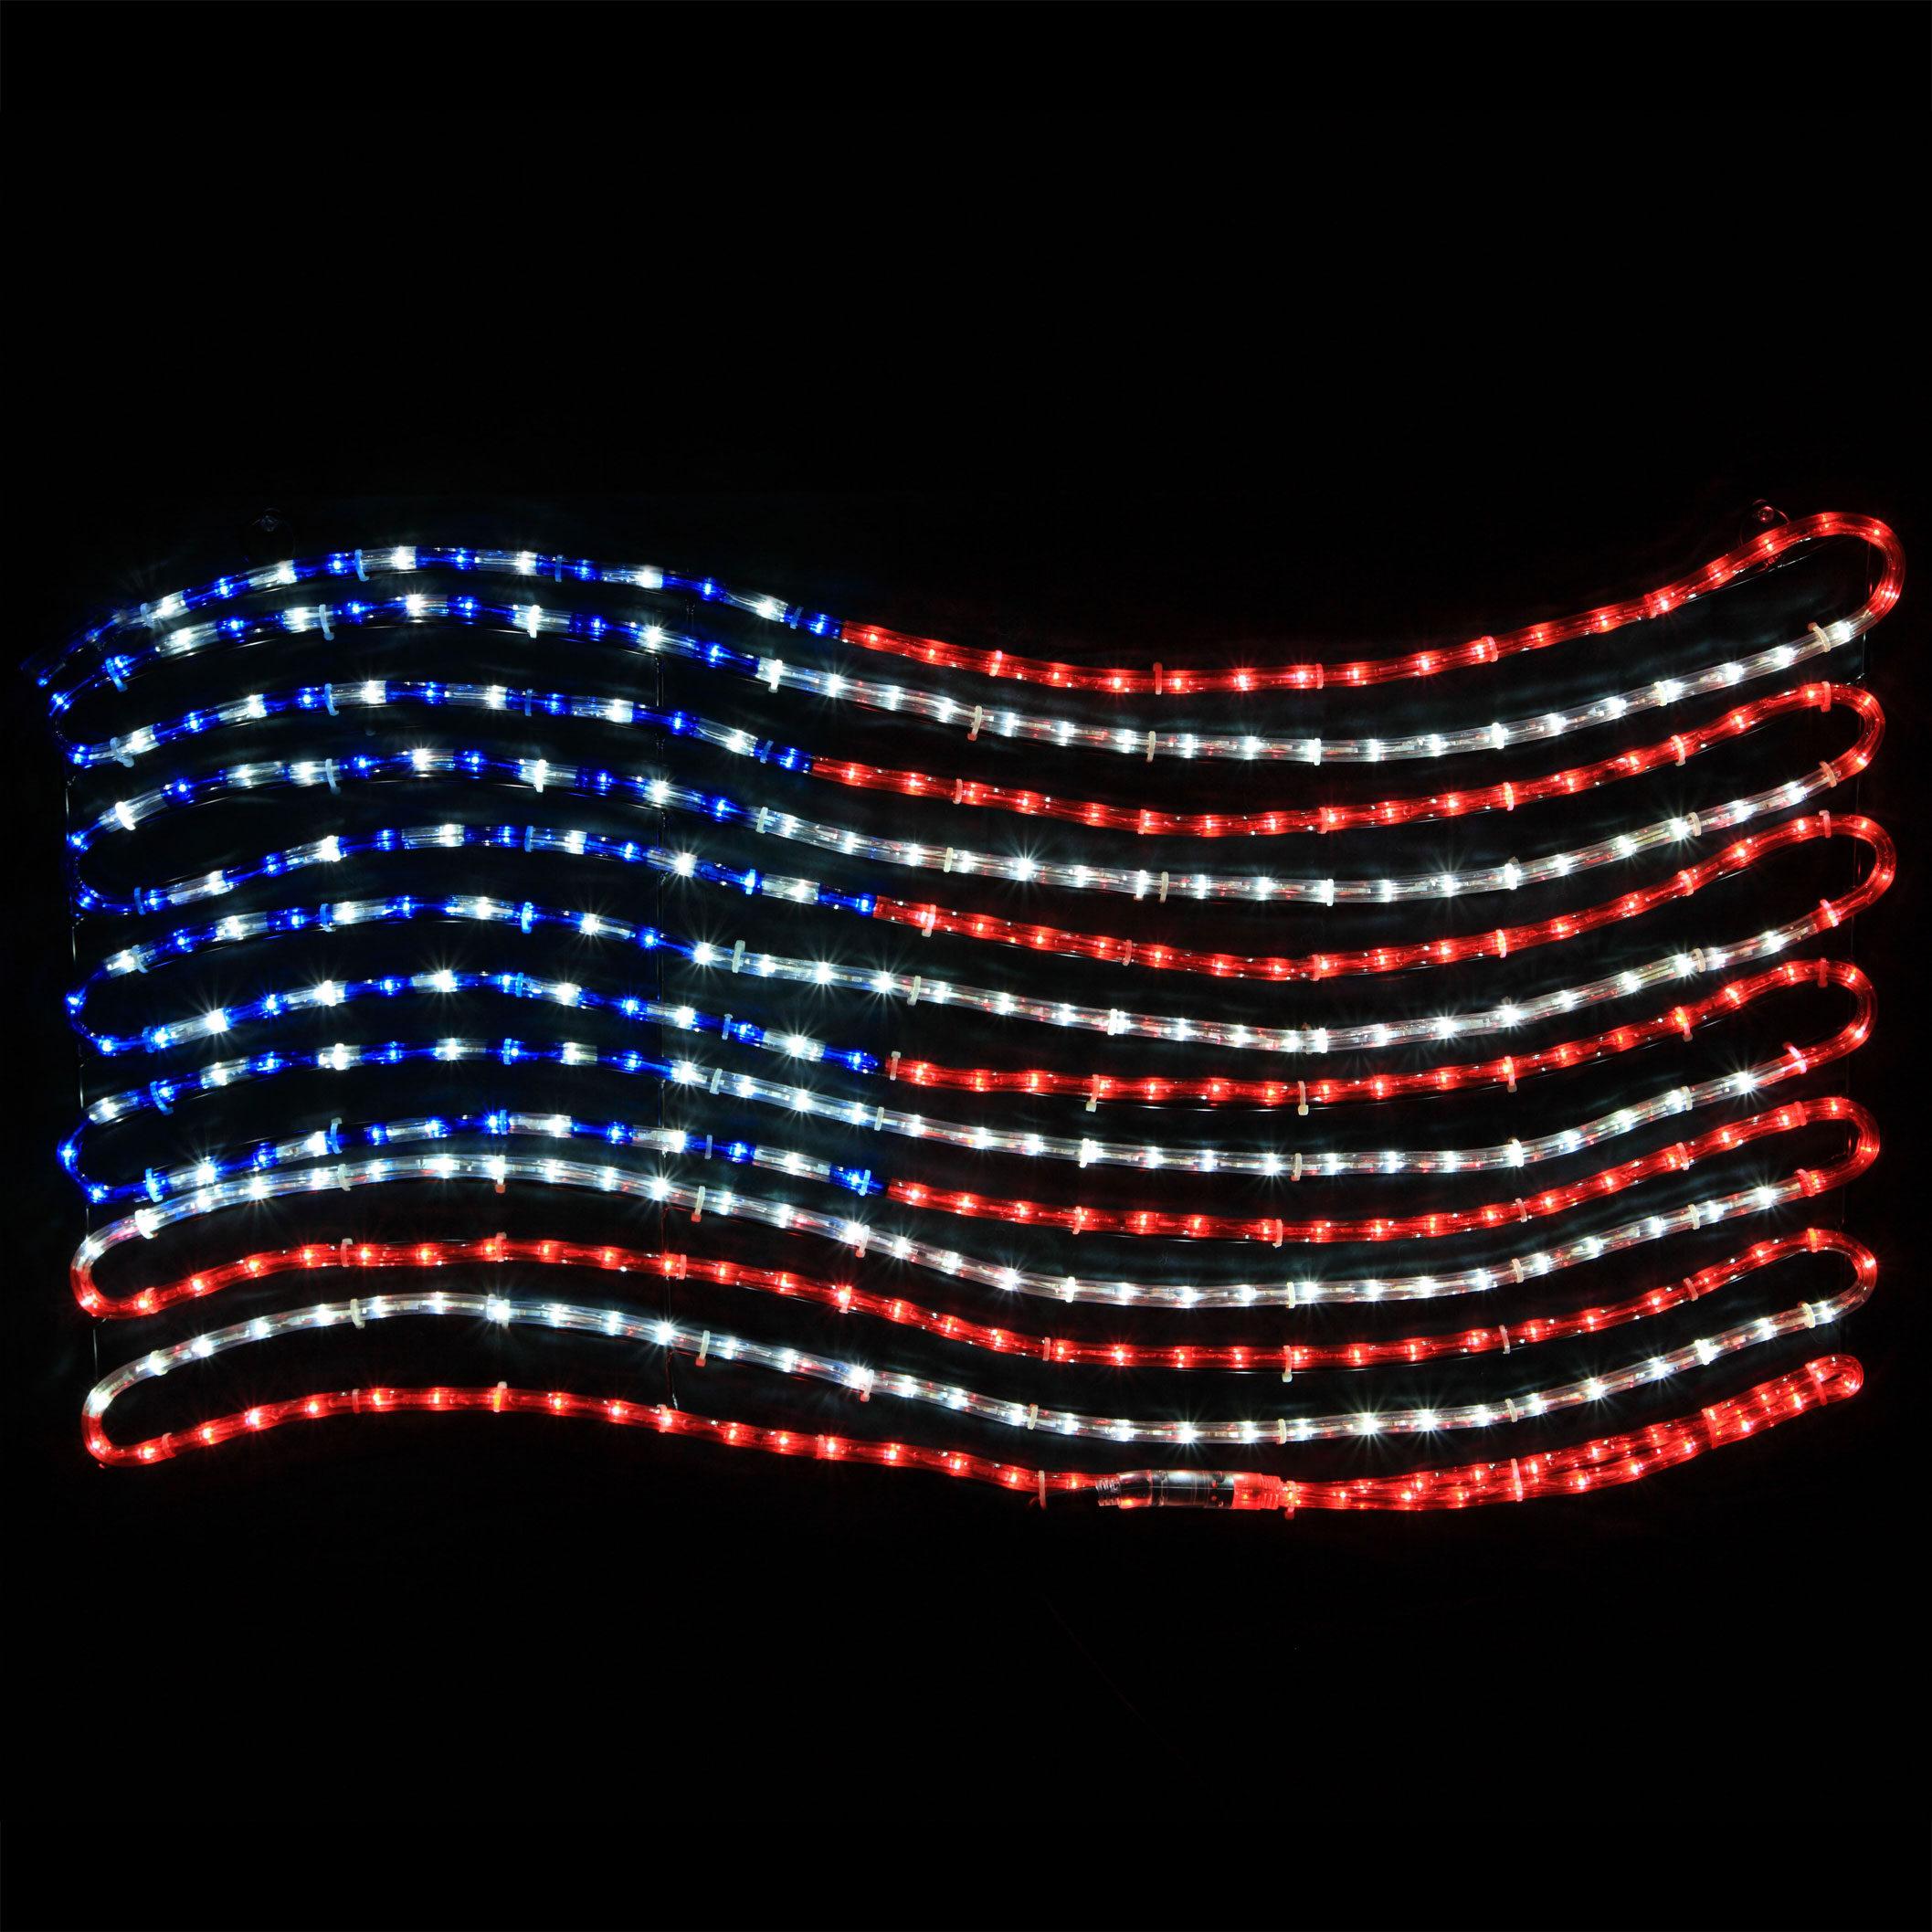 LED Rope Light Patriotic Flag  sc 1 st  Yard Envy & LED Rope Light Patriotic Flag - Yard Envy azcodes.com